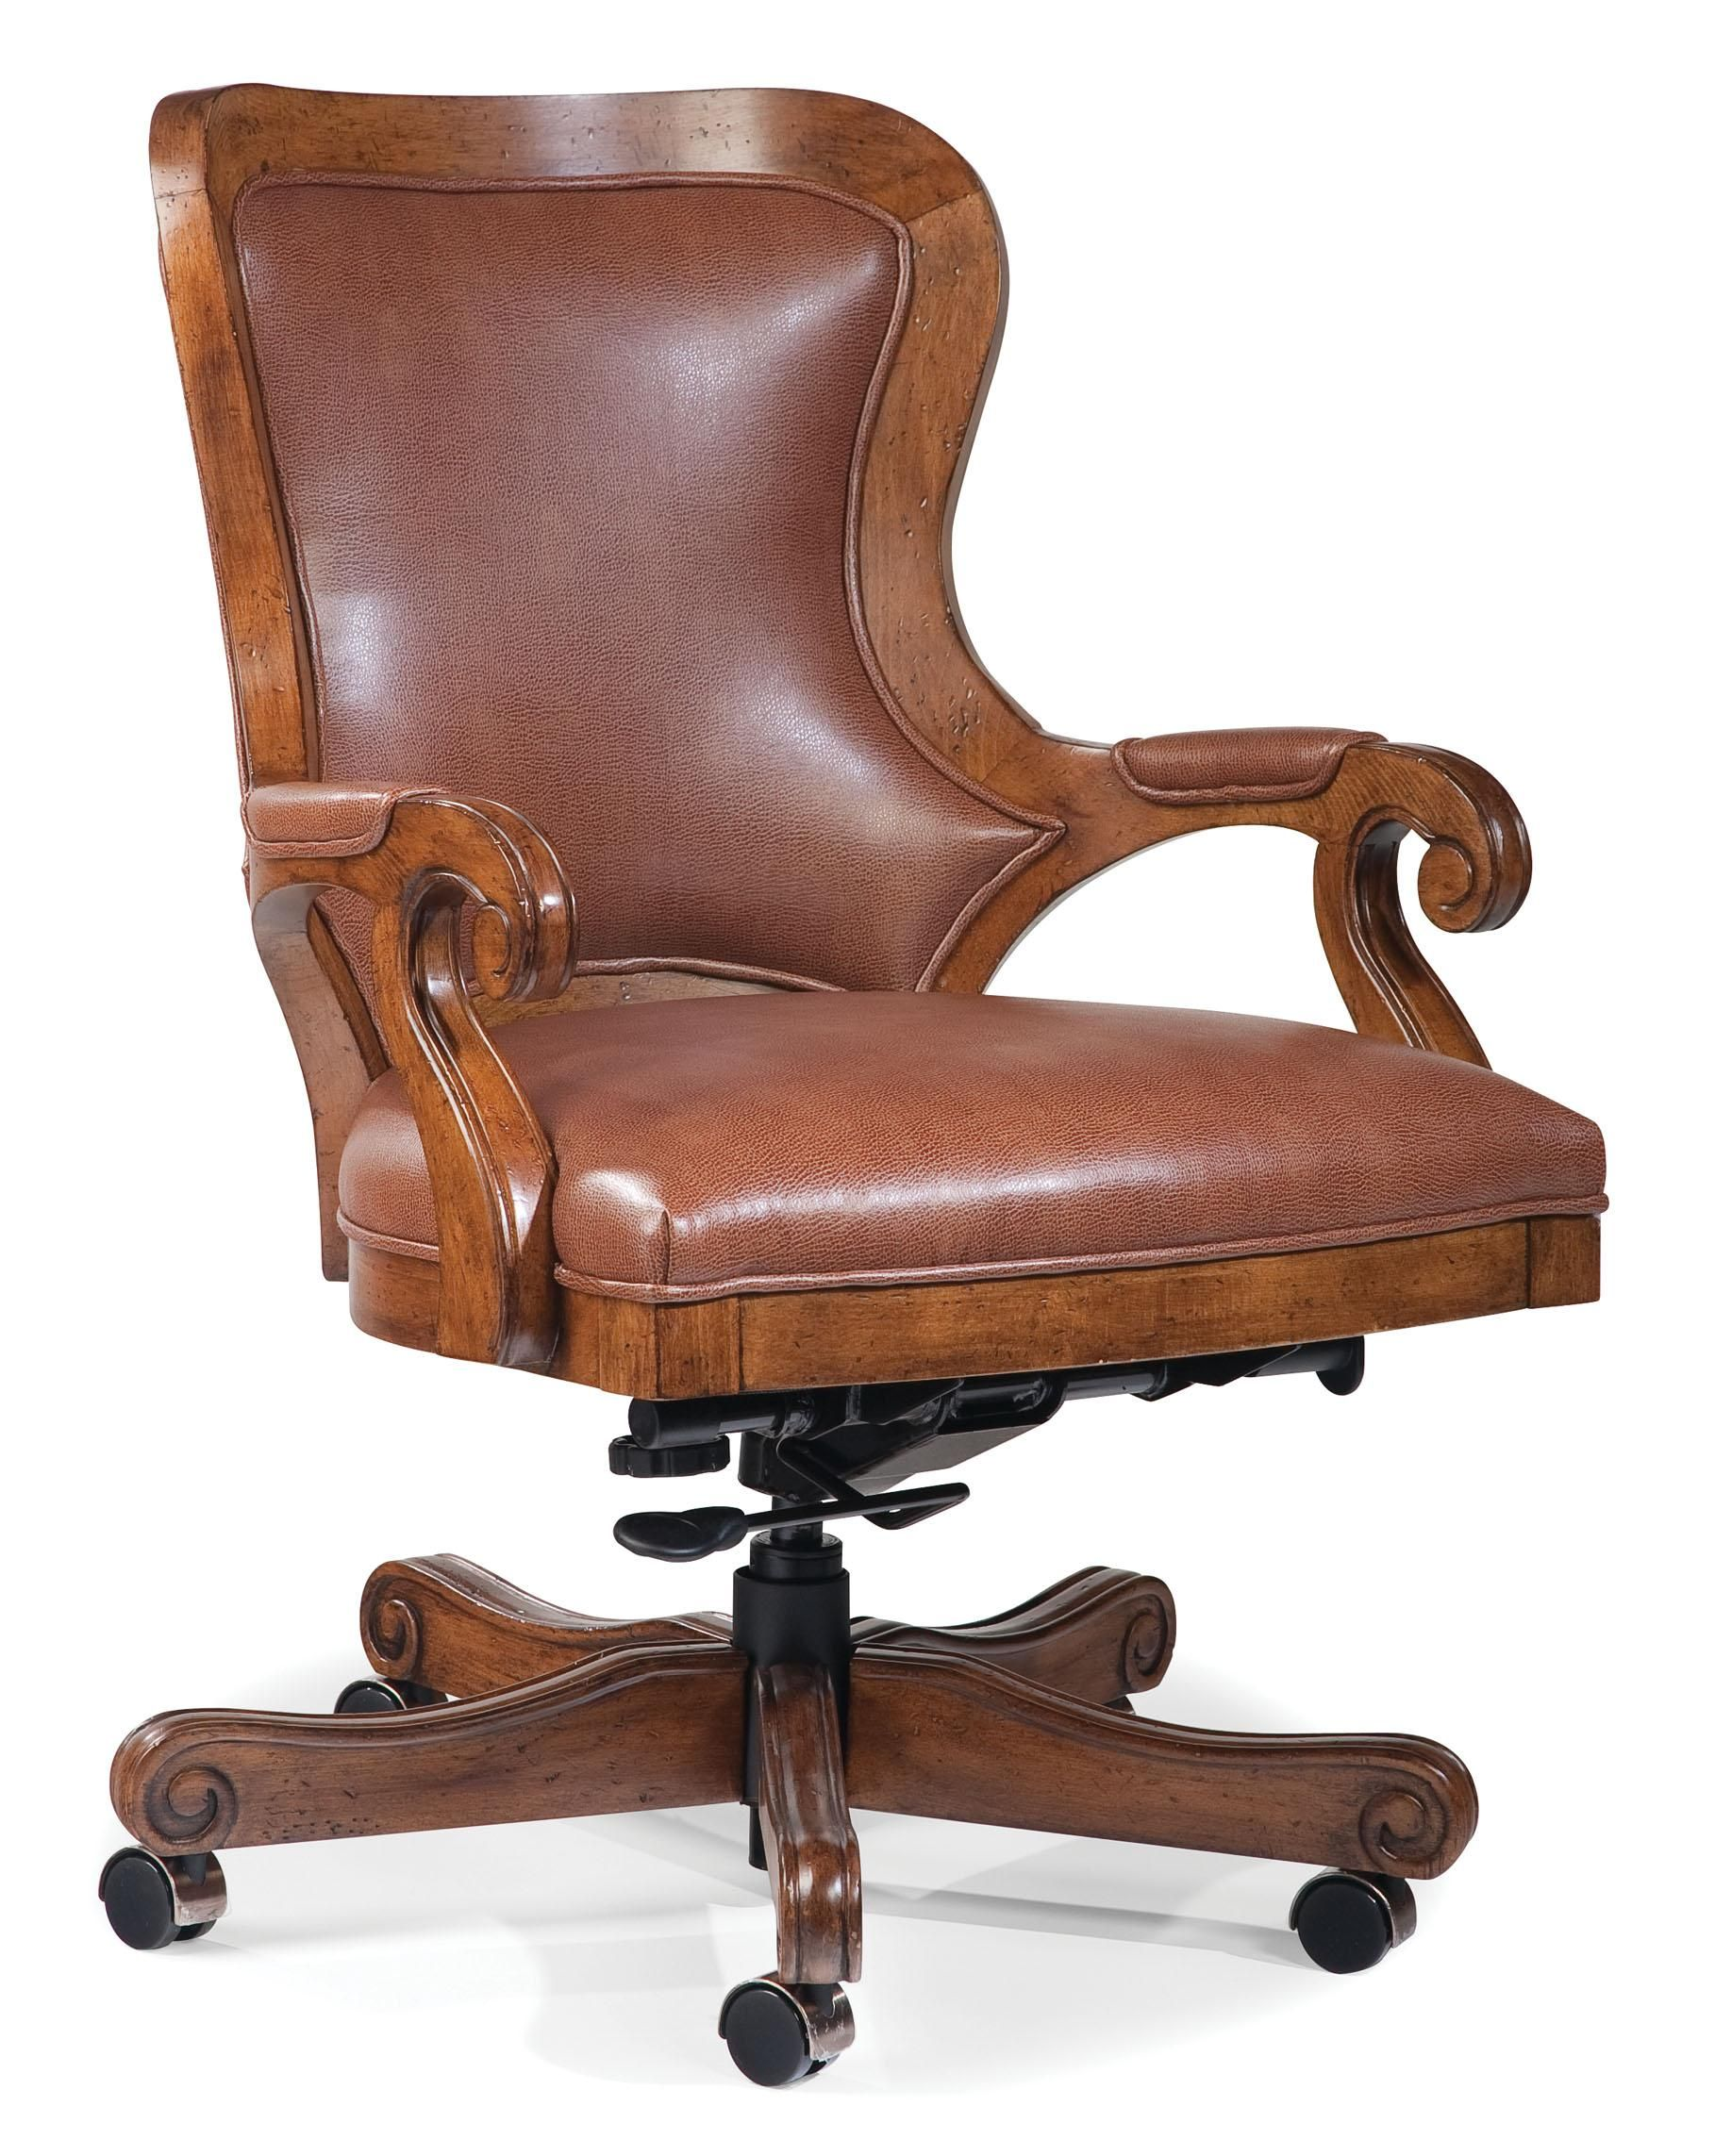 Office Furnishings Executive Swivel Chair By Fairfield Fairfield